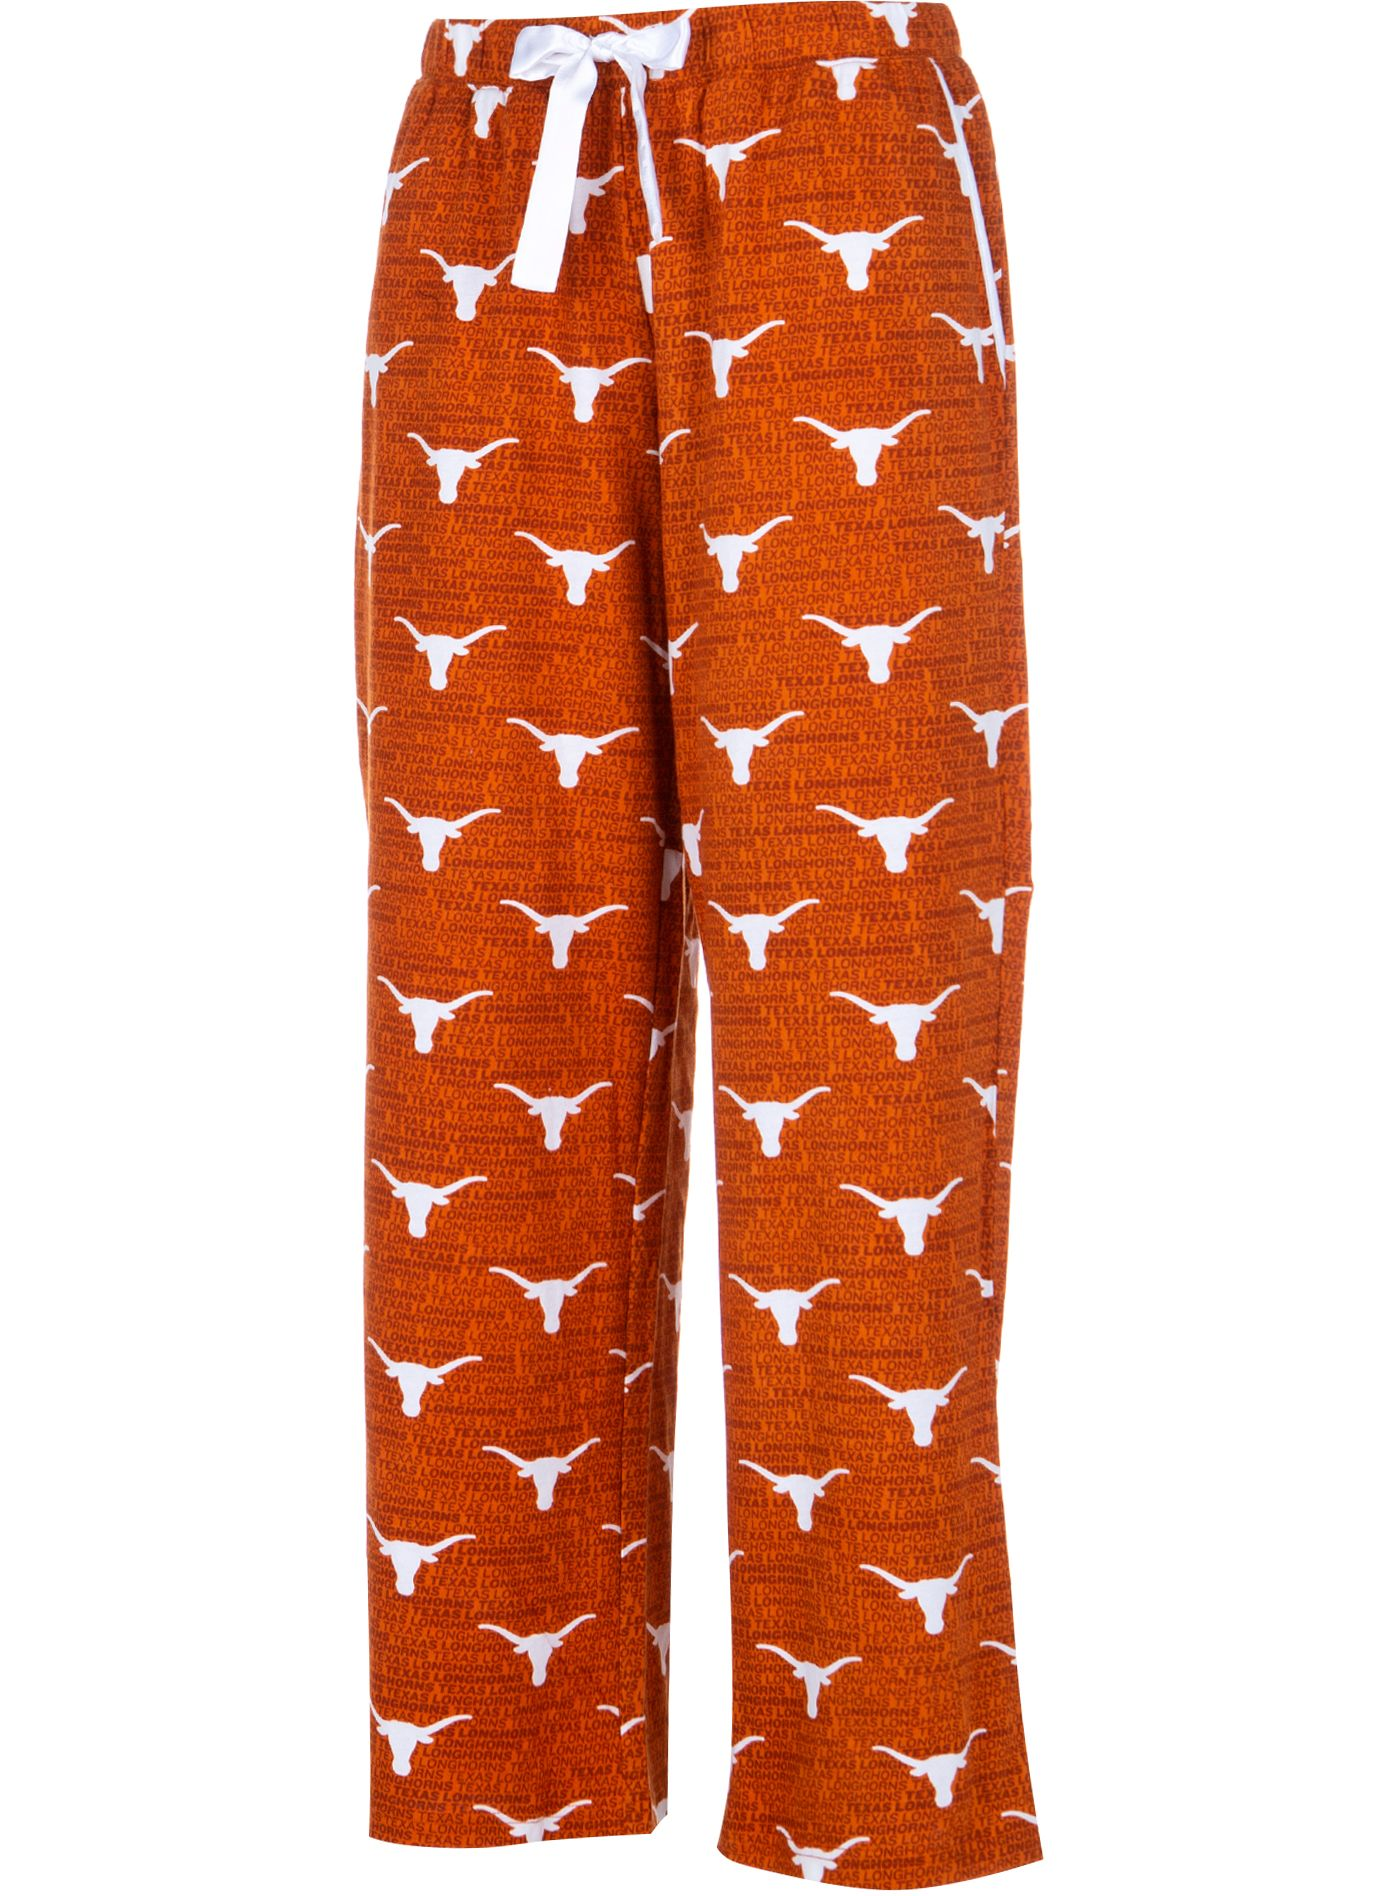 University of Texas Authentic Apparel Women's Texas Longhorns Burnt Orange Shayla Sleep Pants